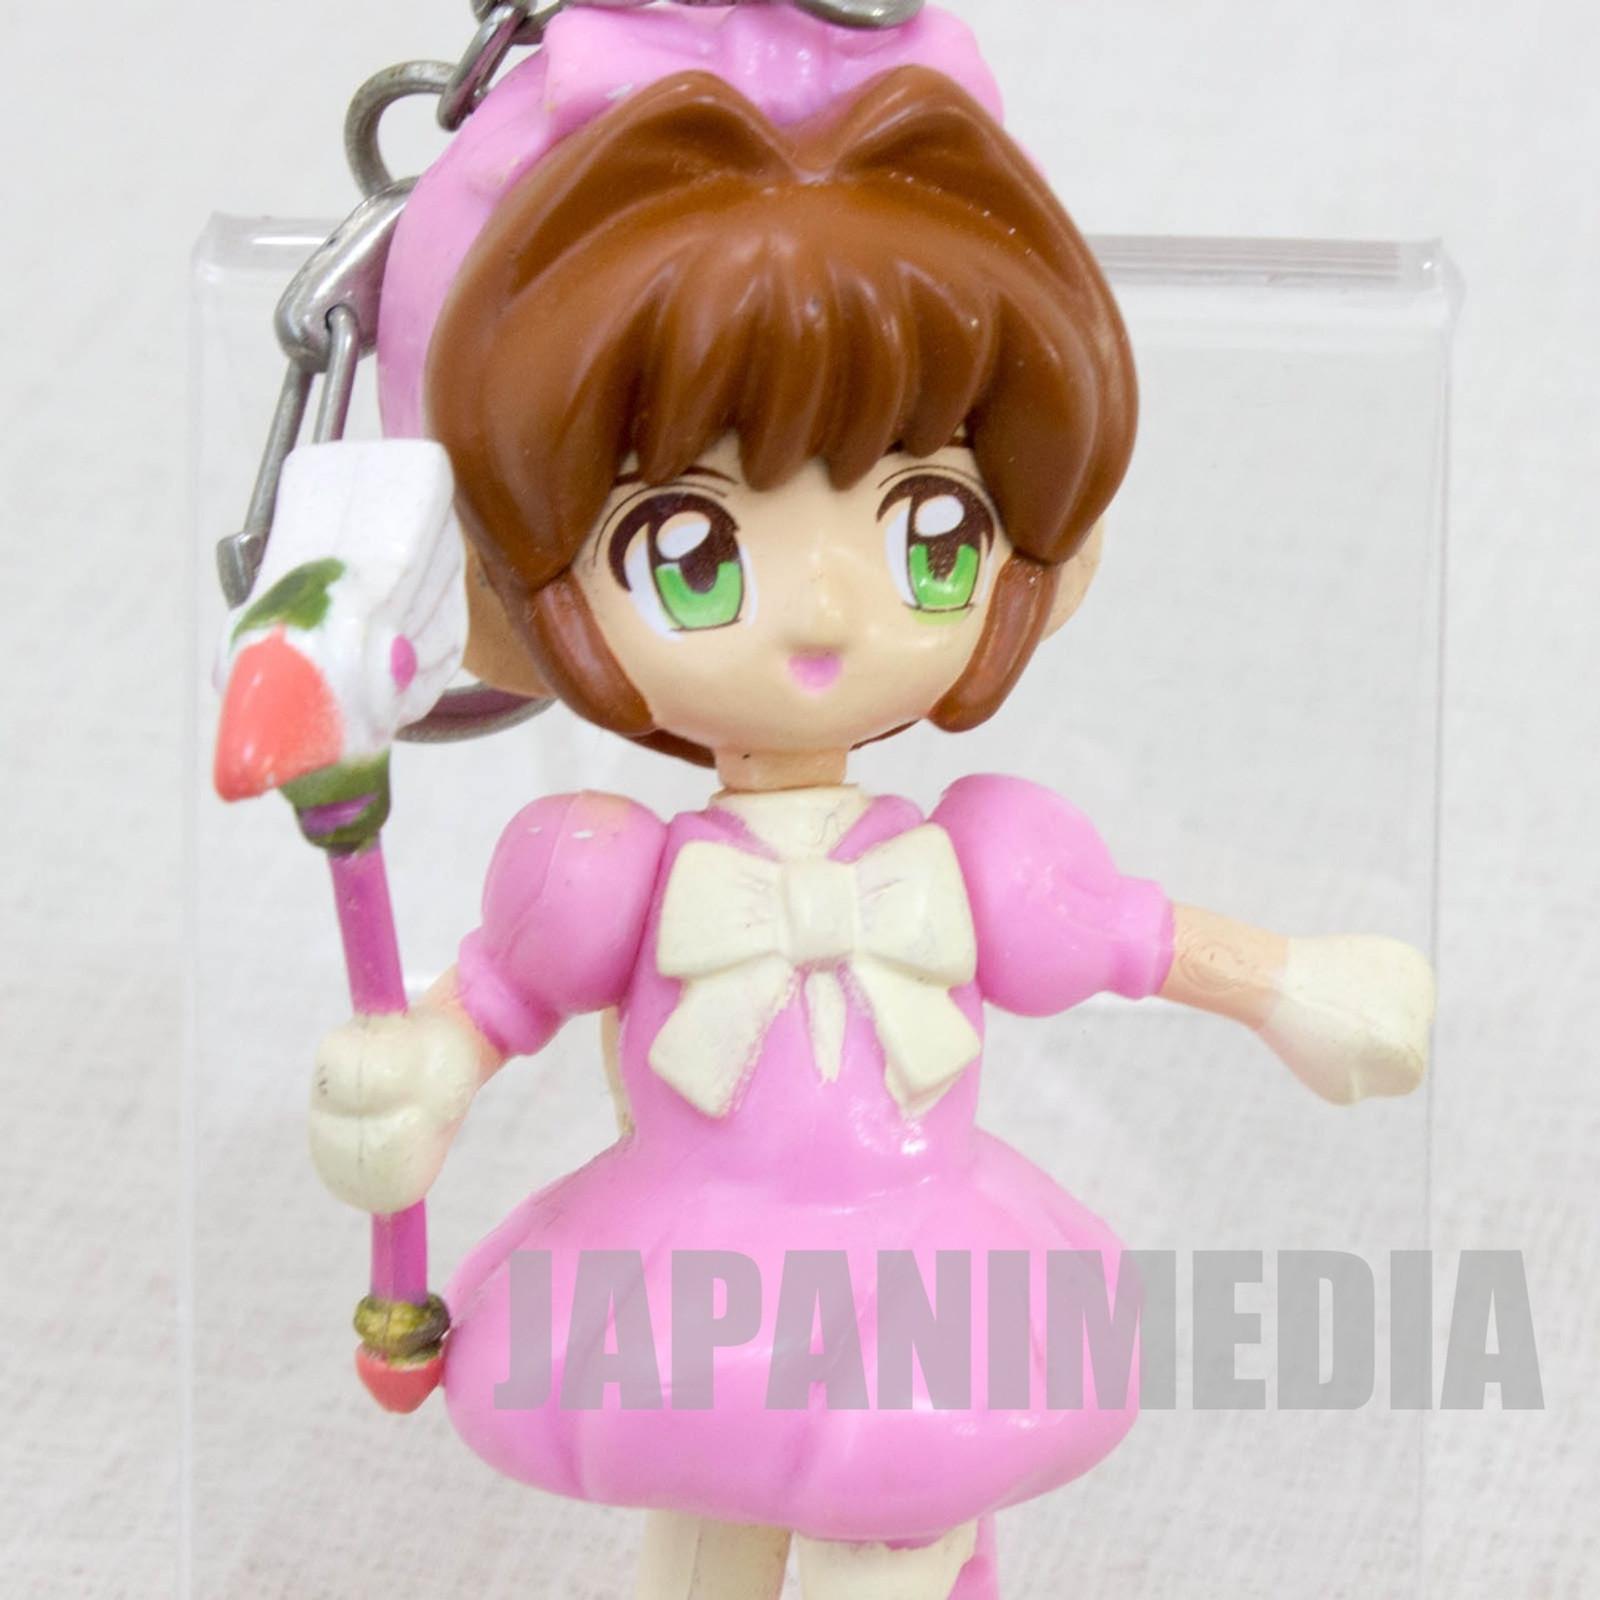 "Cardcaptor Sakura Battle Costume B Mascot Figure 3"" Keychain Clamp JAPAN ANIME"